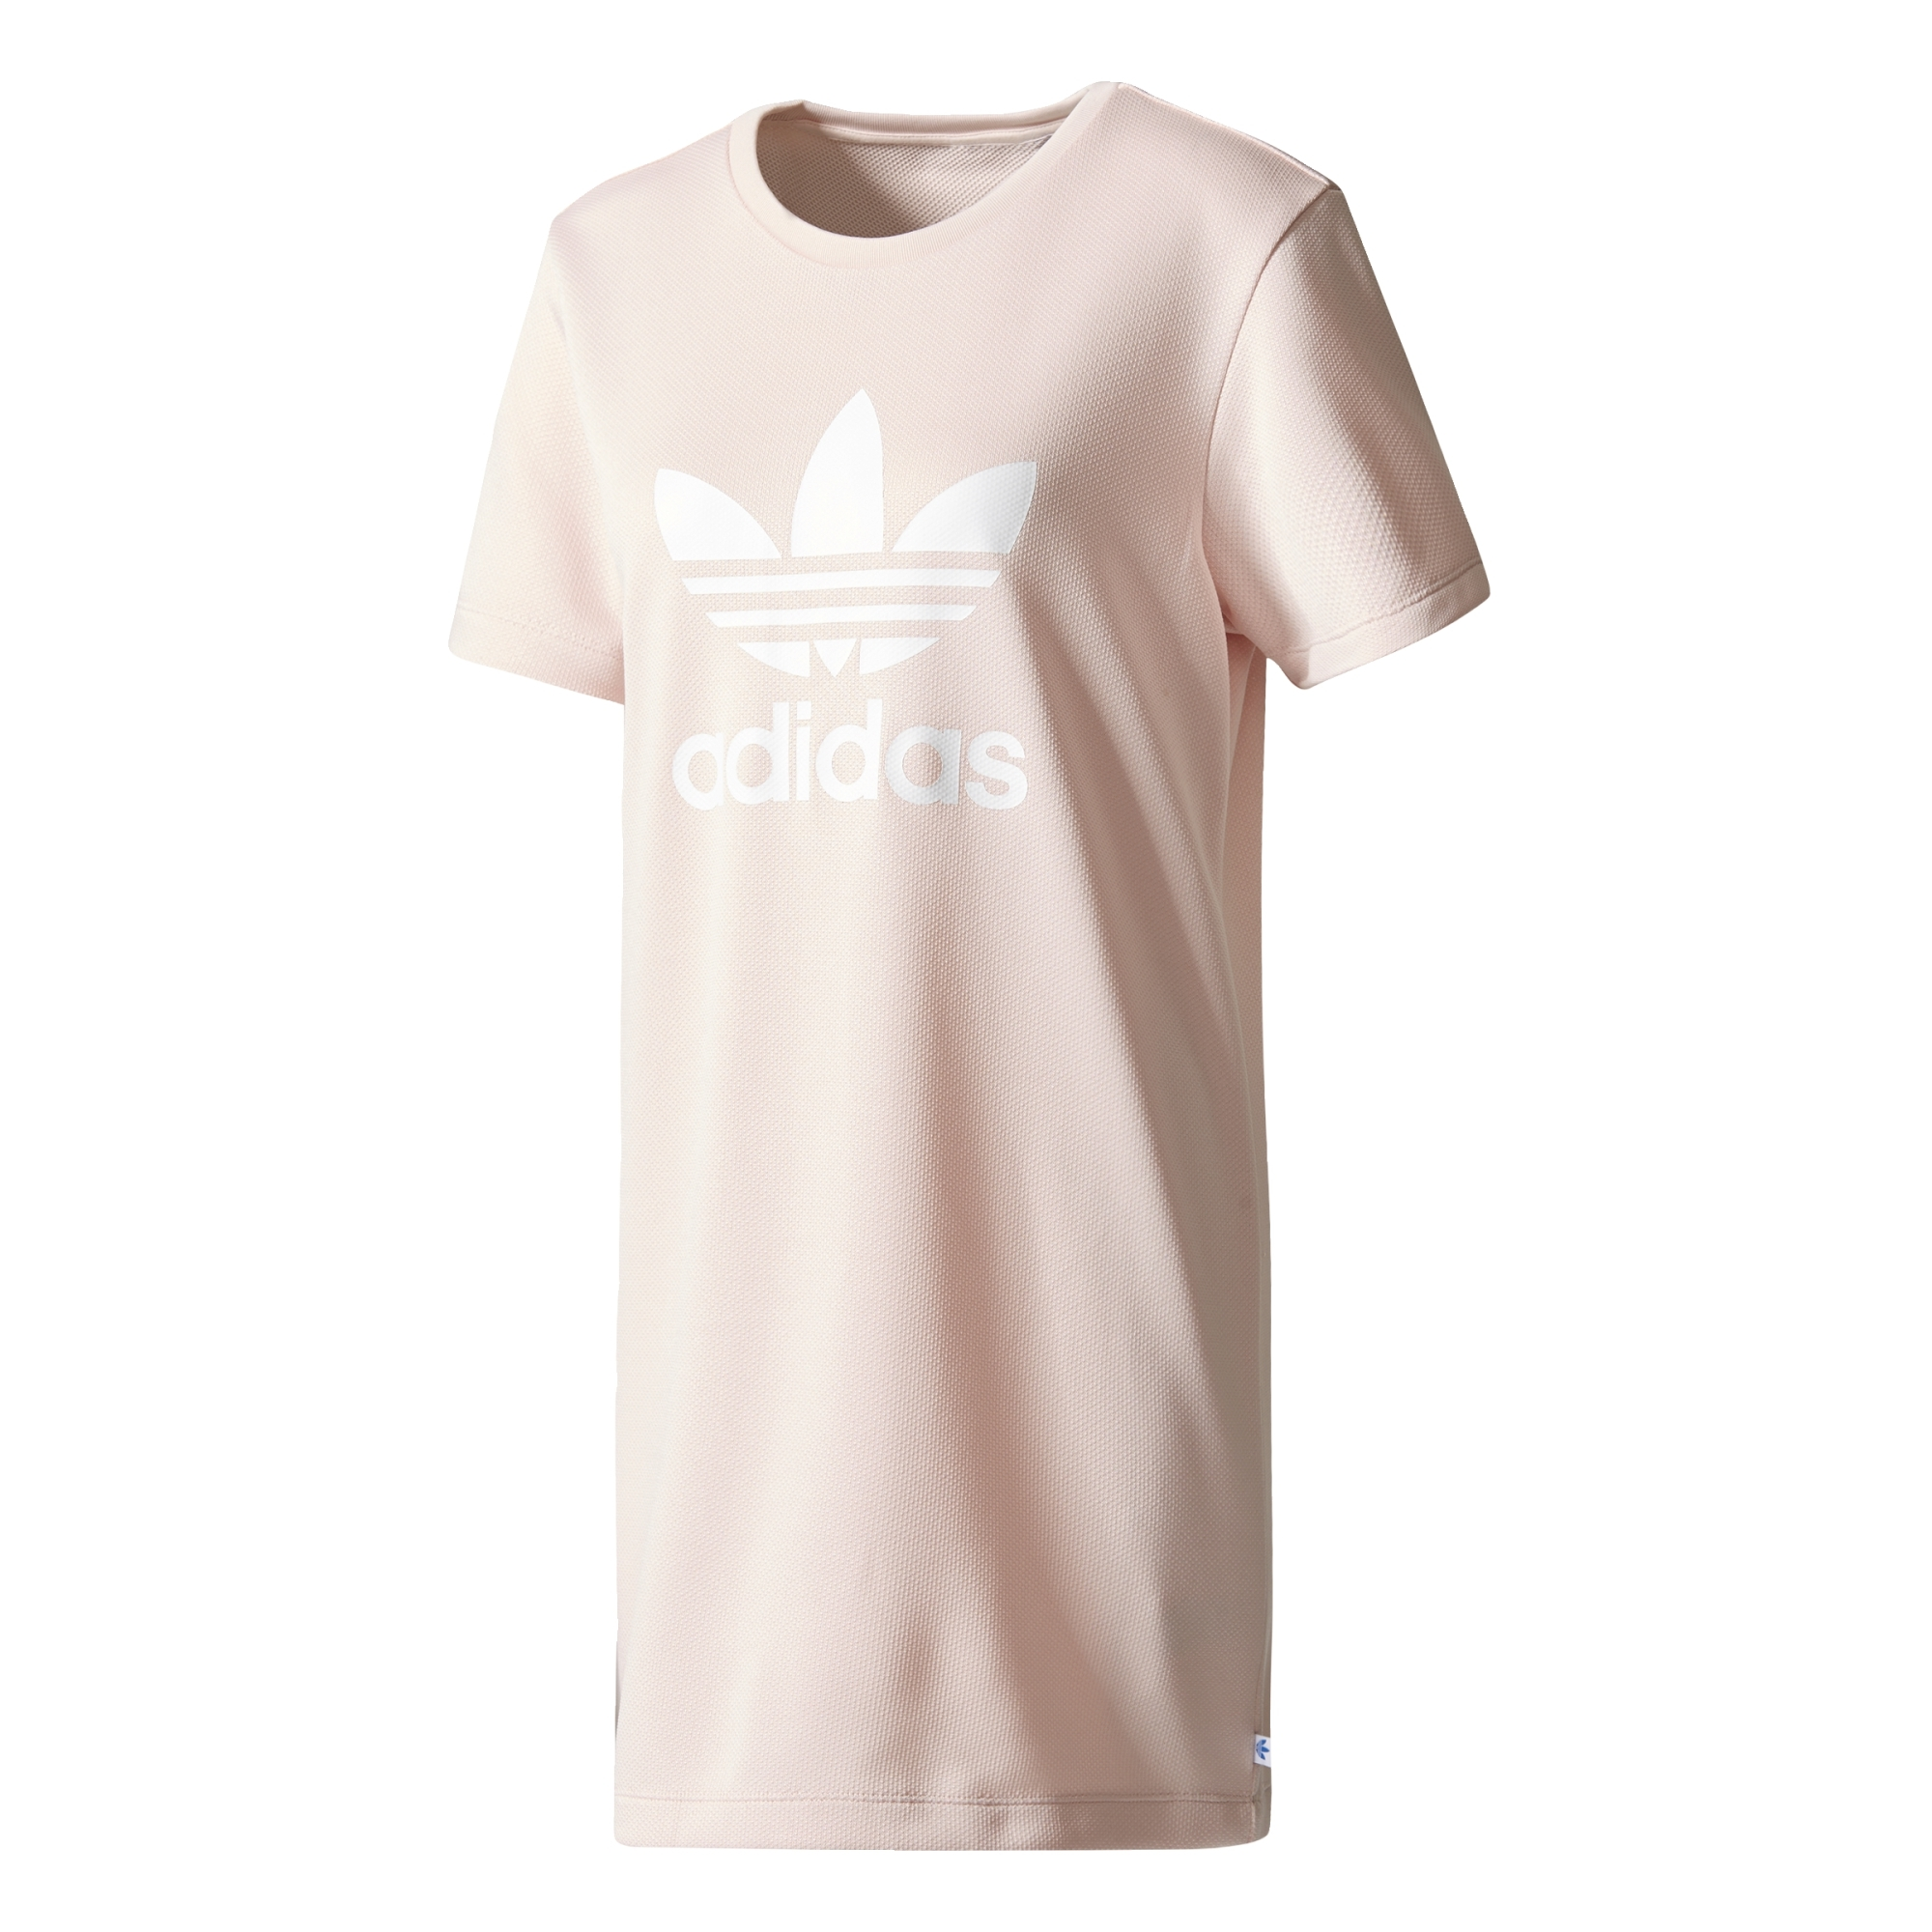 Adidas Originals Trefoil Tee Dress (pink icy) 8e20c49ca2a